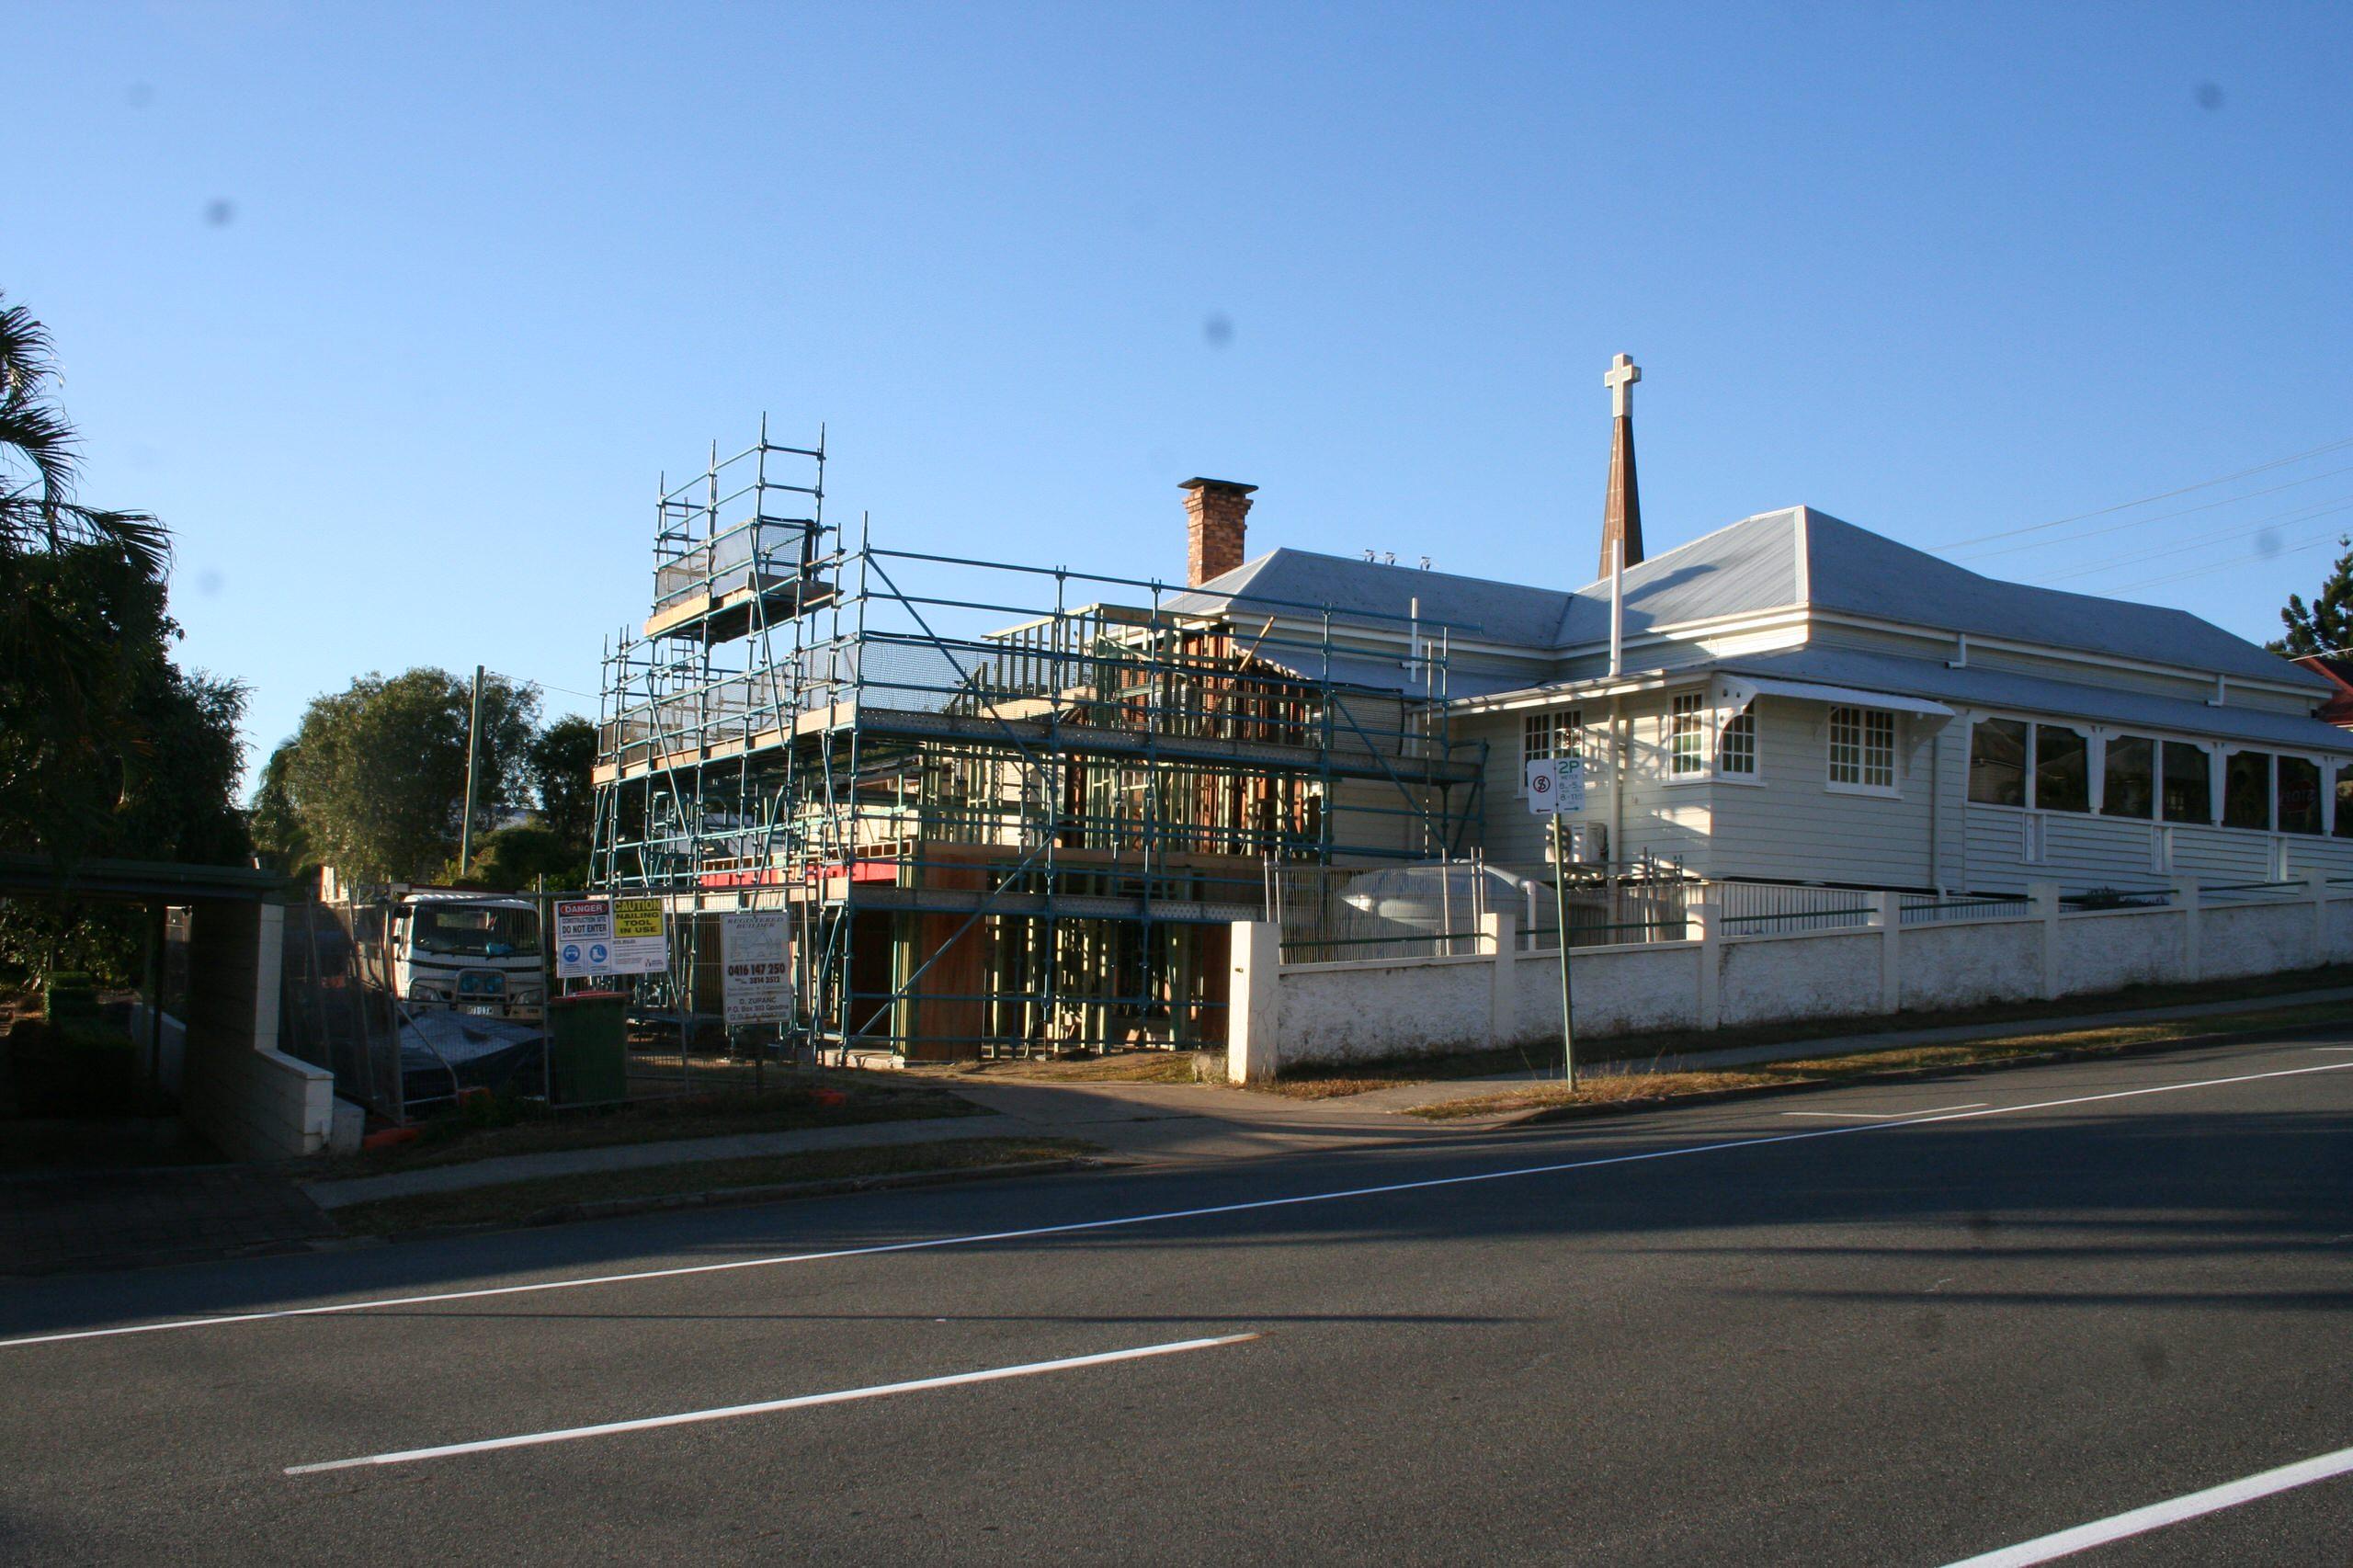 Ipswich Renovations